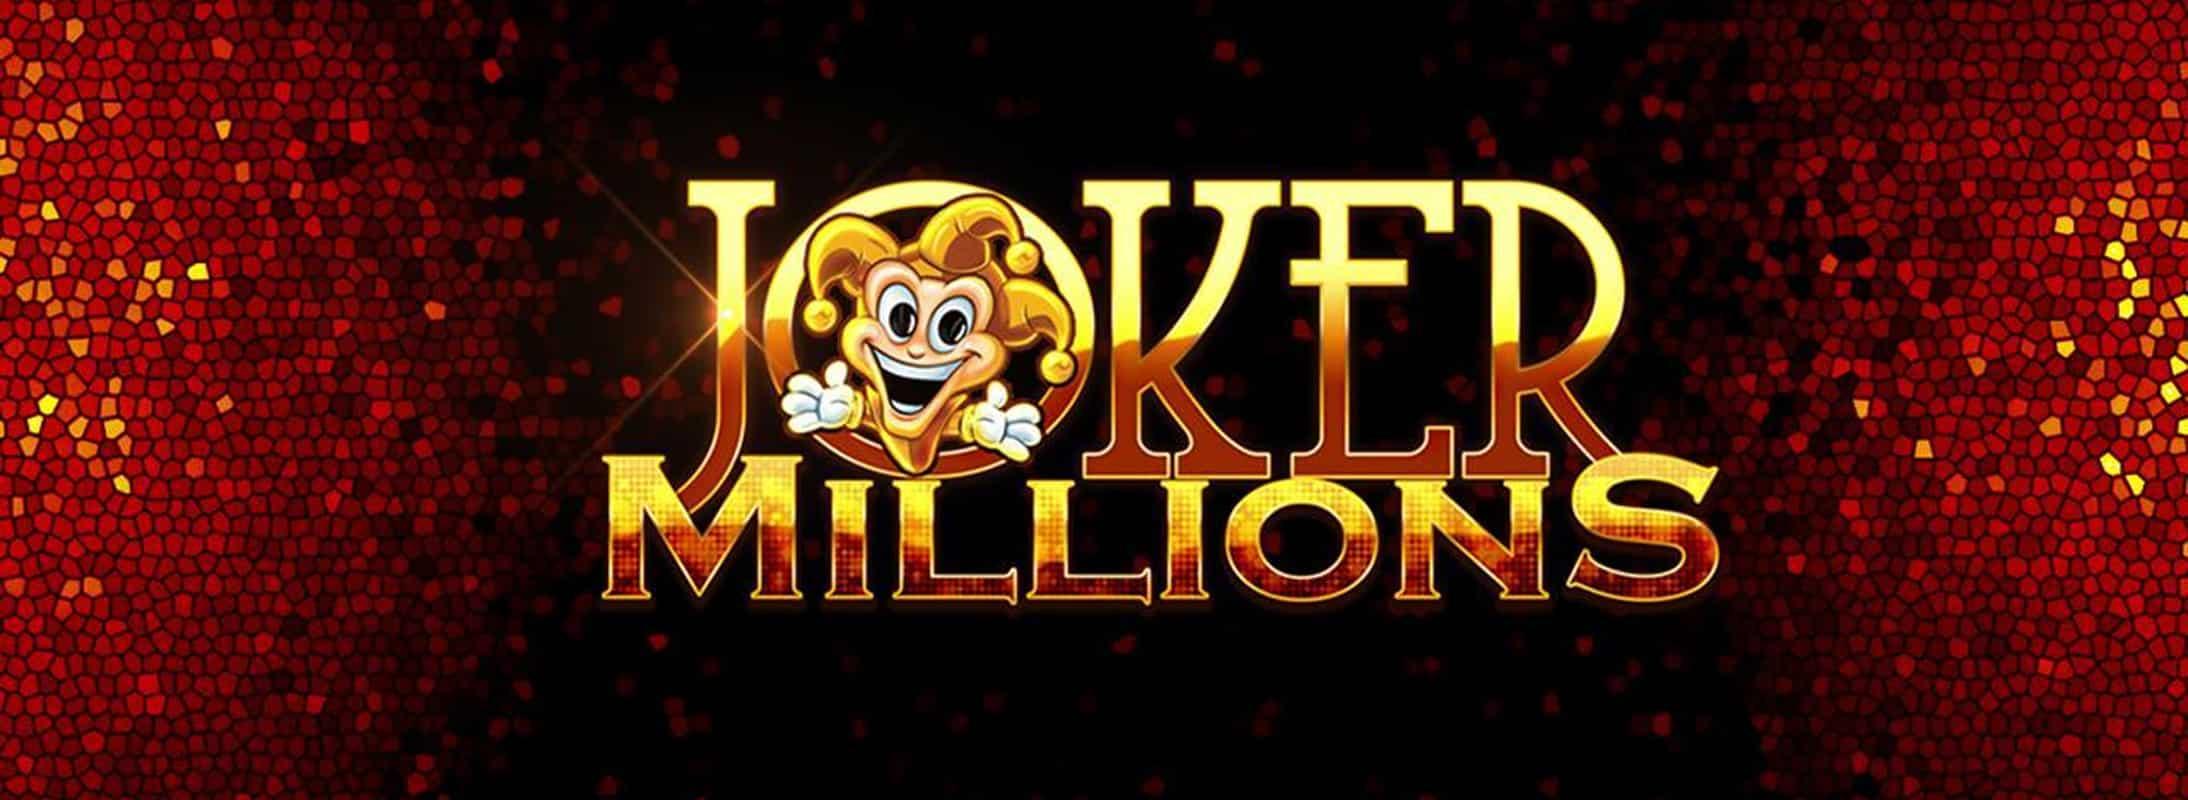 Joker Millions fra Yggdrasil utbetalte 30 millioner kroner hos Casumo - Norway CasinoTop Banner